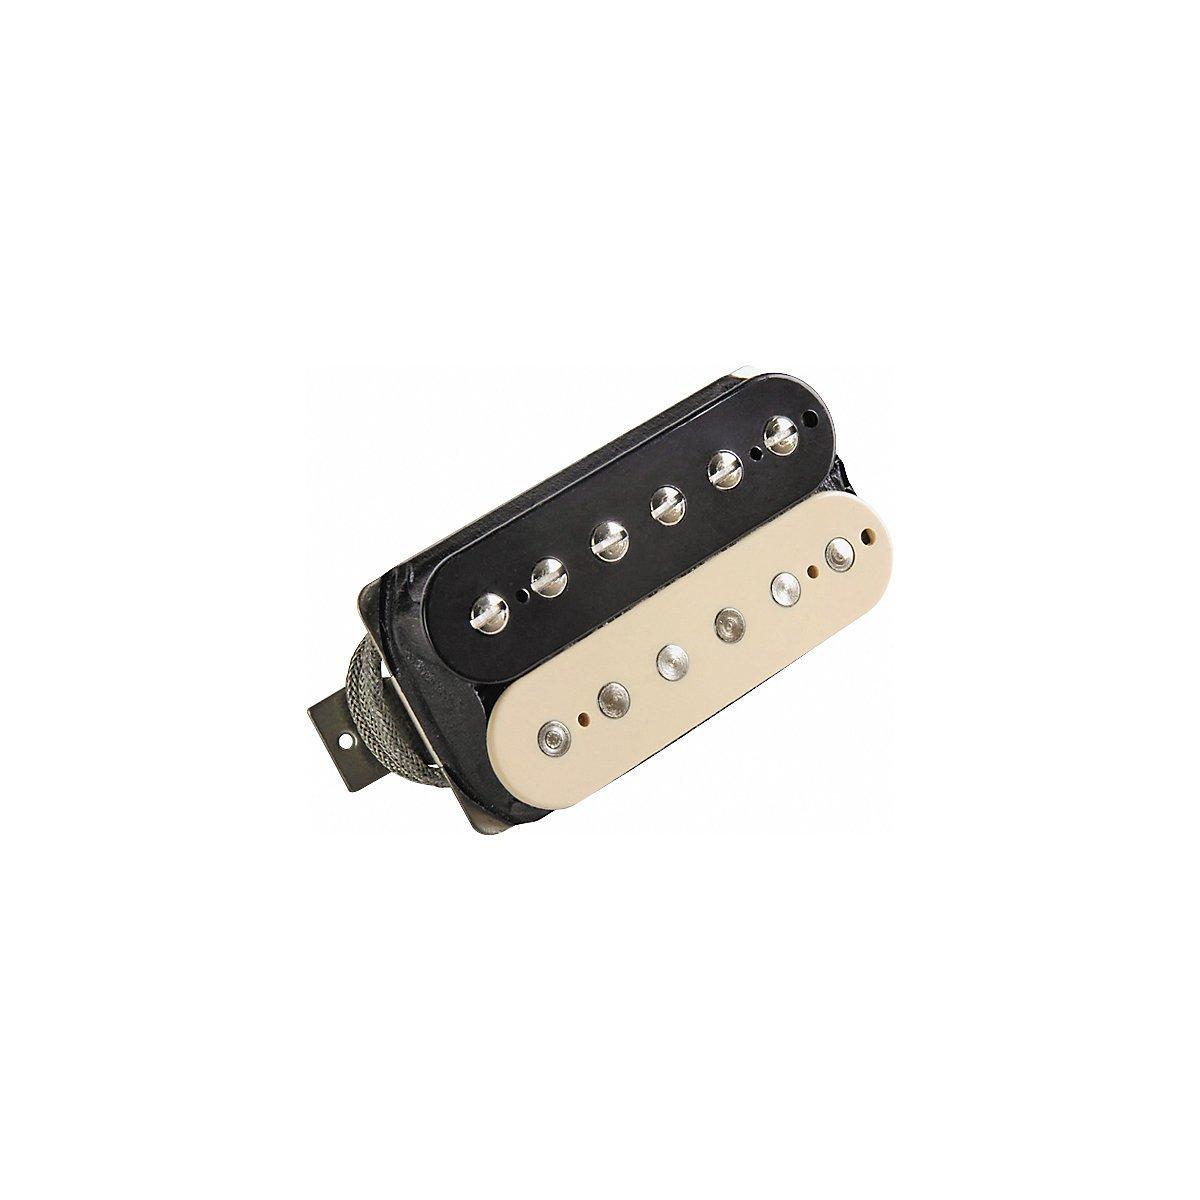 Gibson Gear IM90T-ZB 490T Pickup Ponte Modern Classic con Rivestimento Zebra